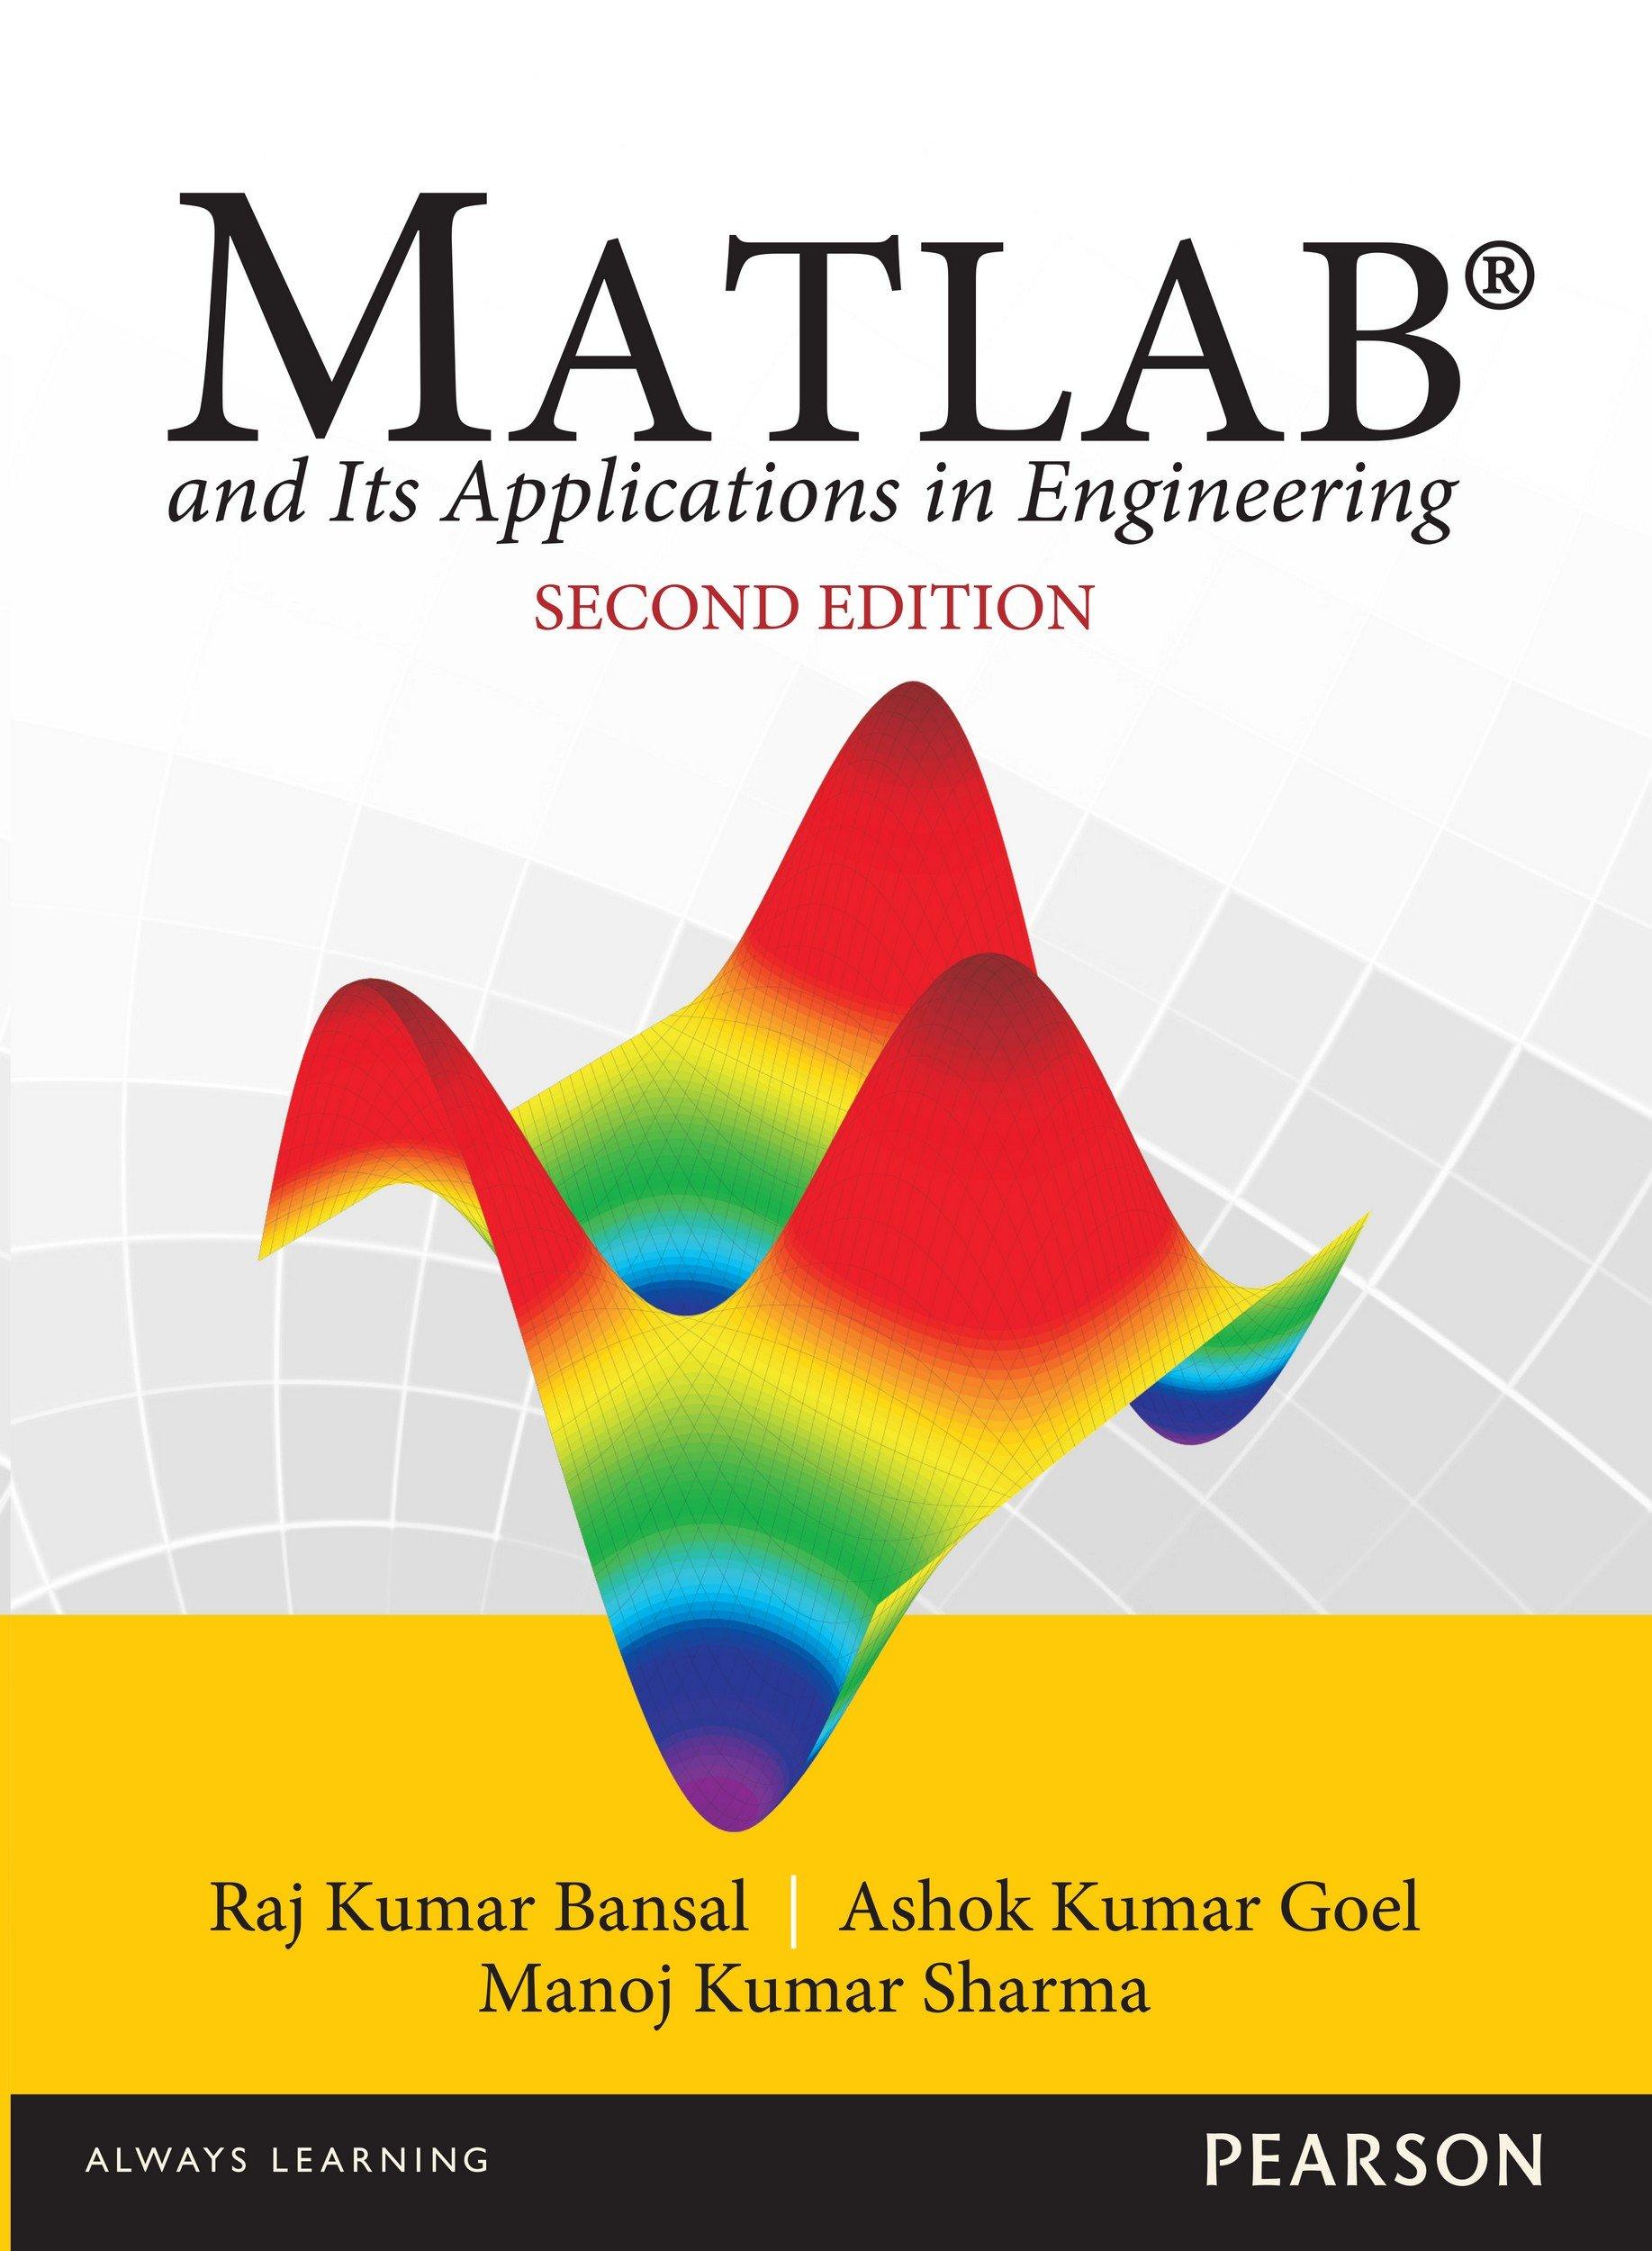 Download Rudra Pratap Matlab Pdf Free Sevenelder Circuit Simulatorcircuit Design And Simulation Software List